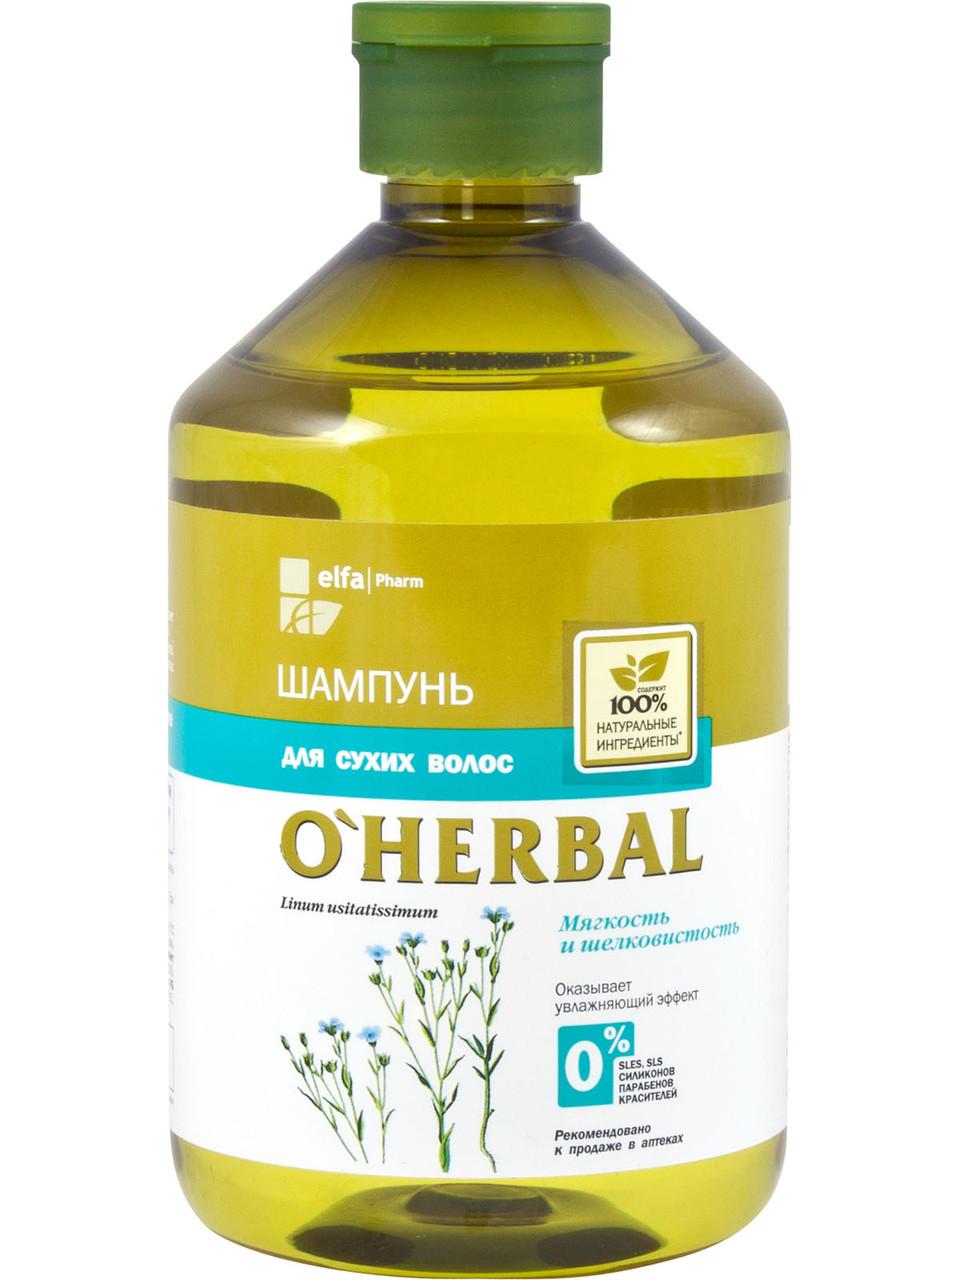 O'Herbal Шампунь для сухих волос 500мл